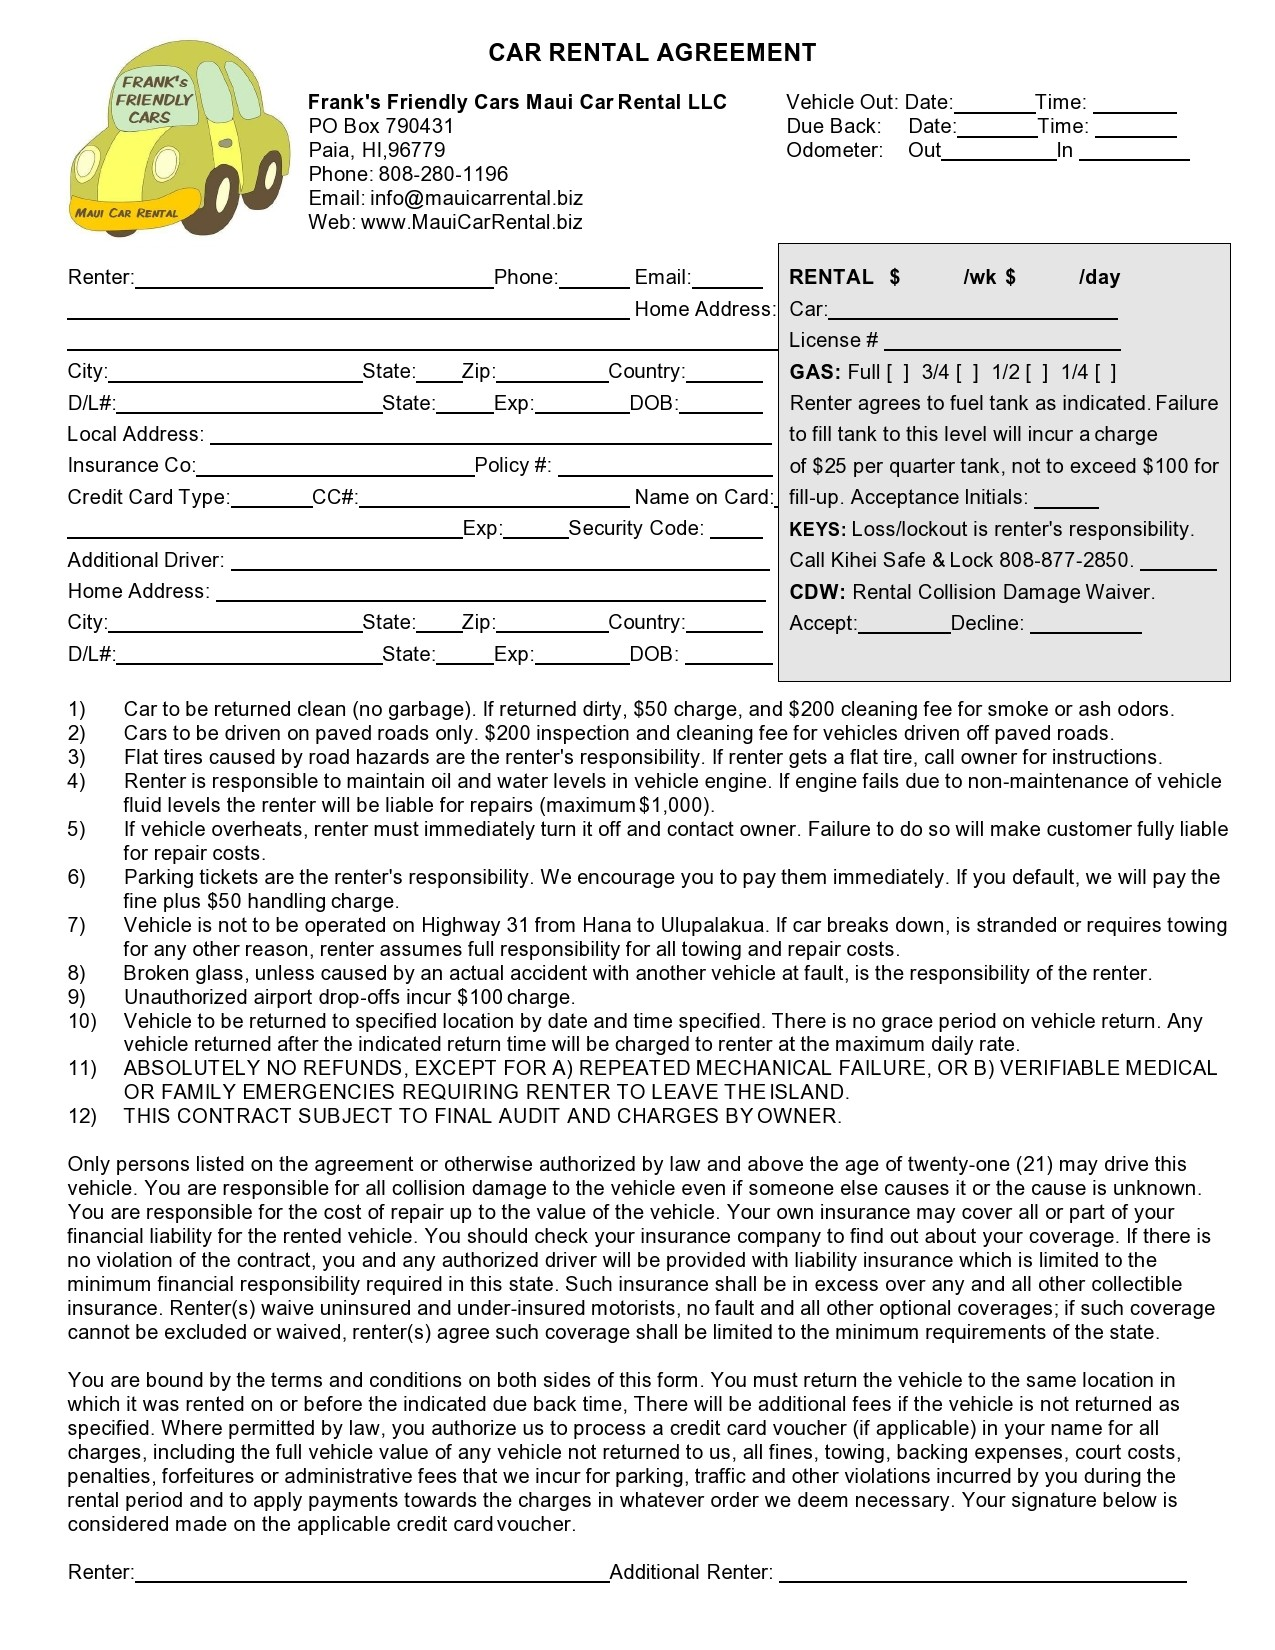 Free car rental agreement 28